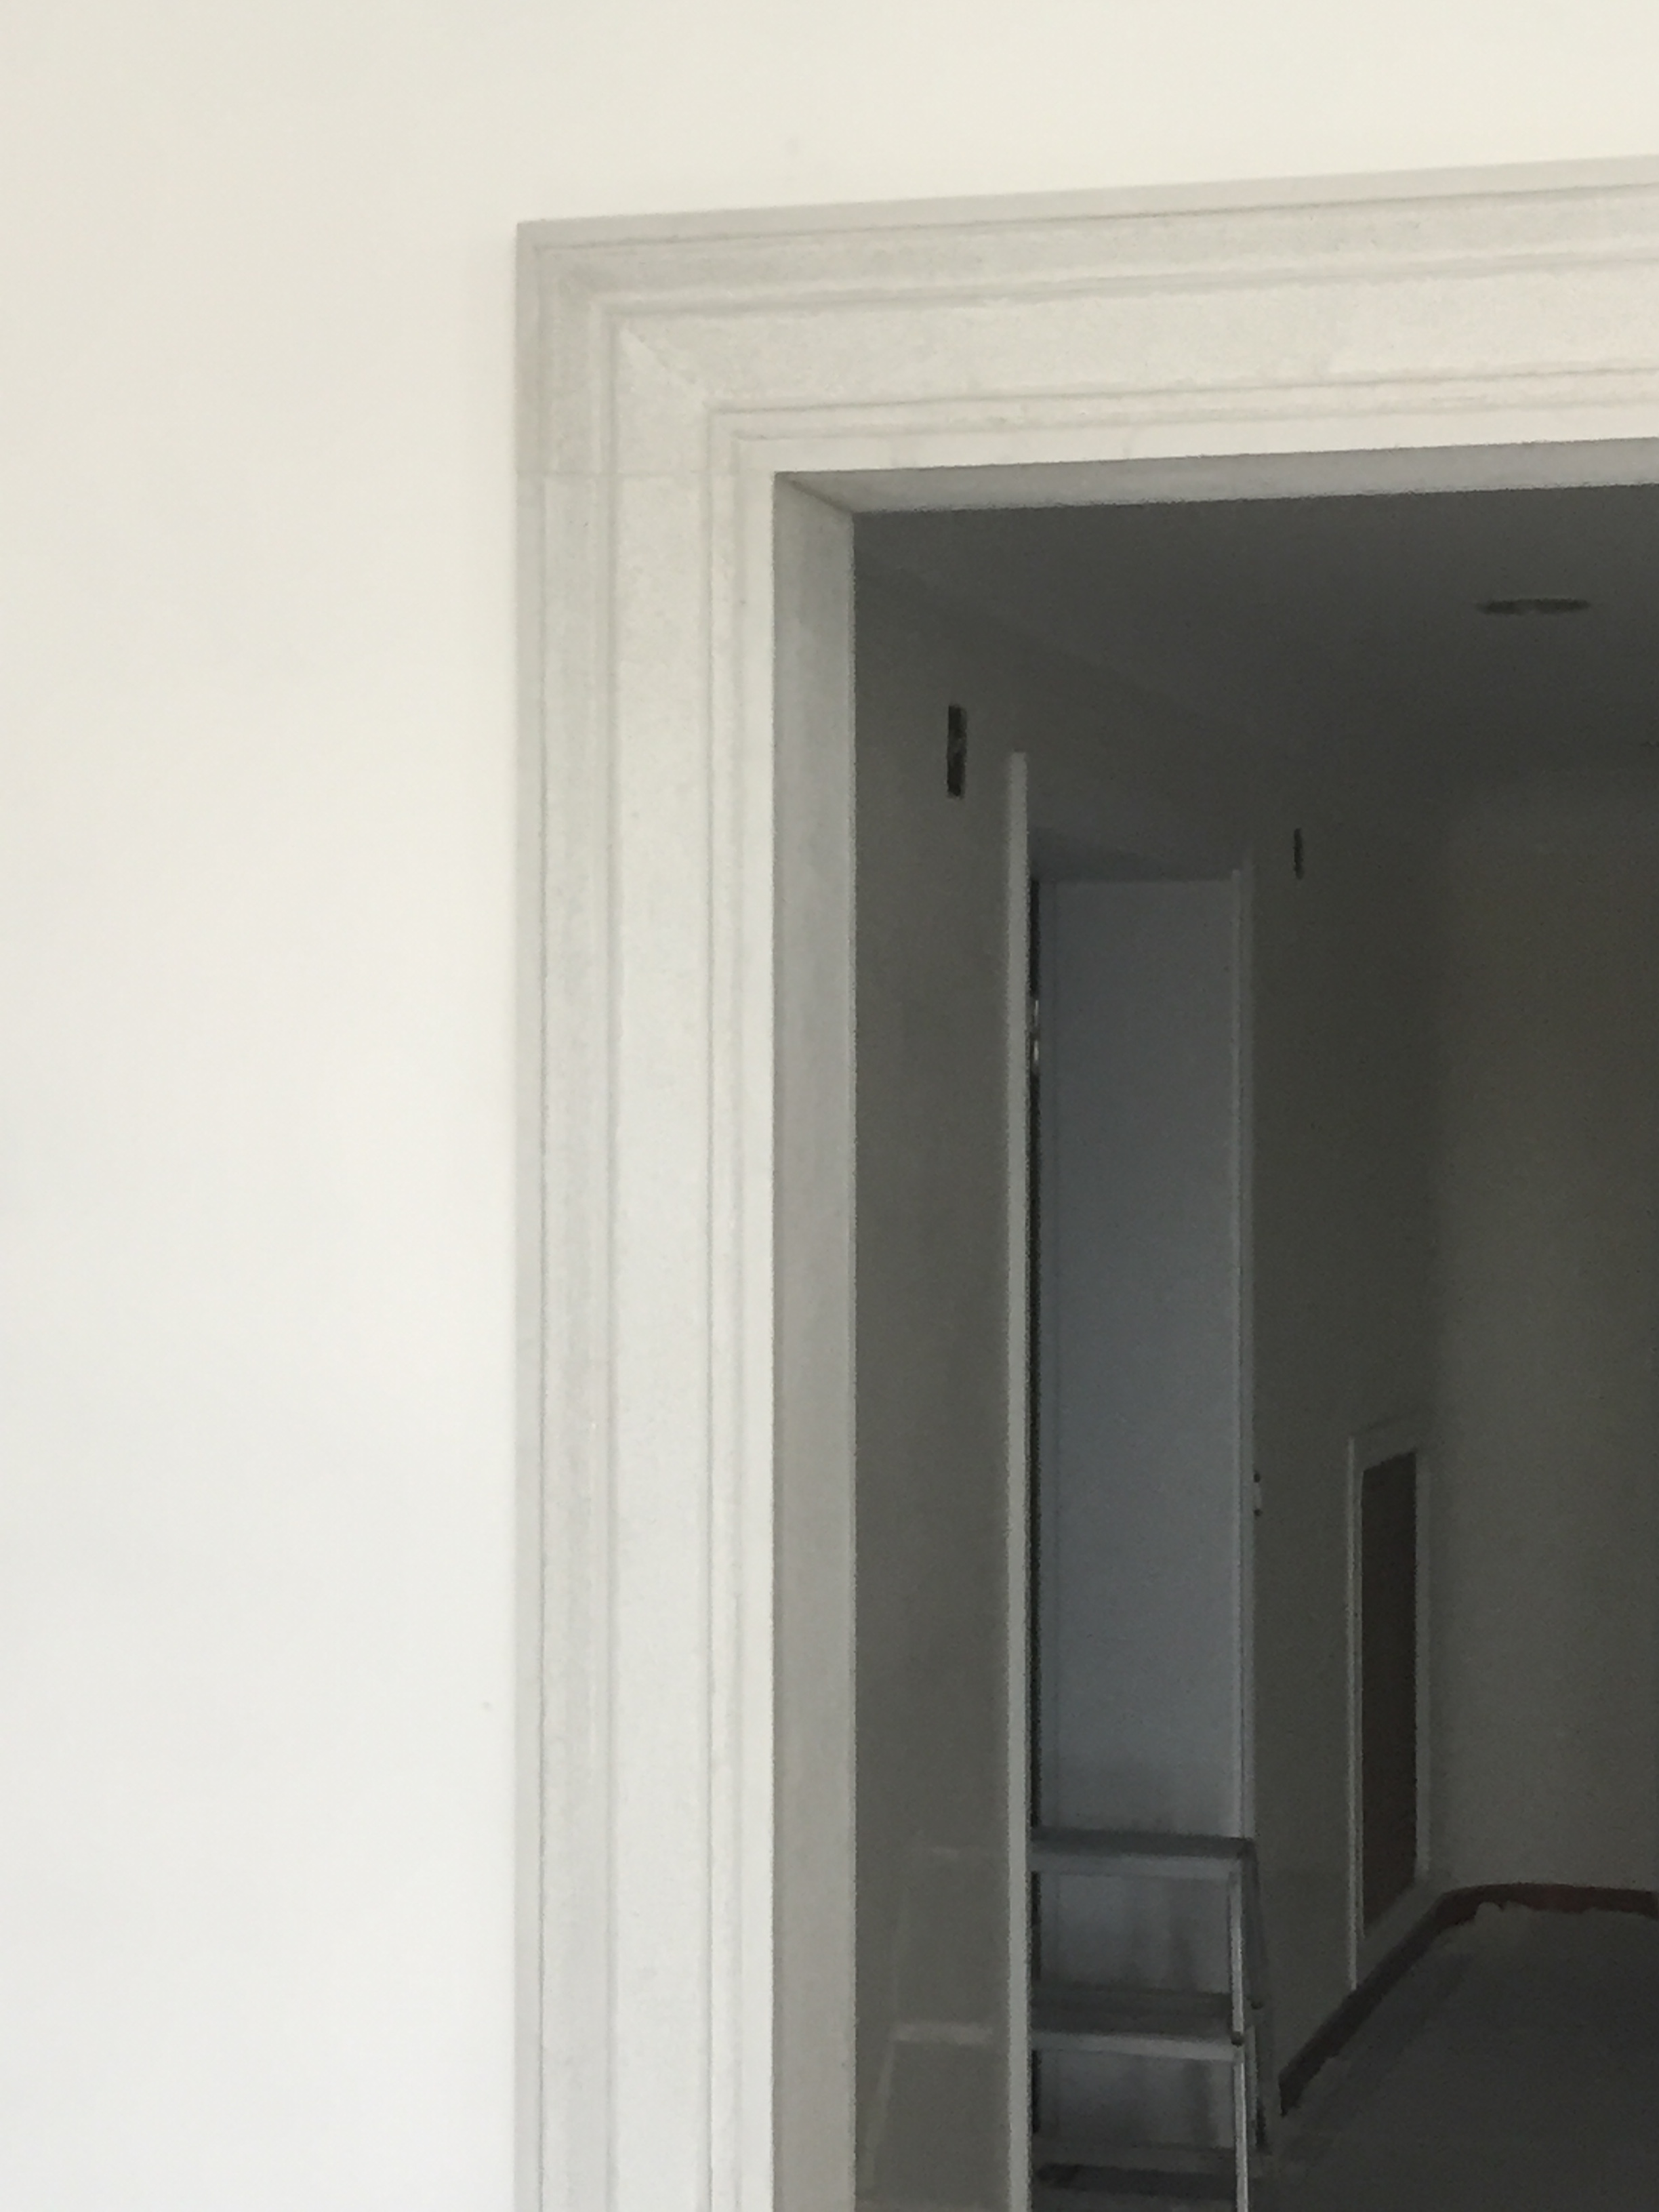 Shaped portal